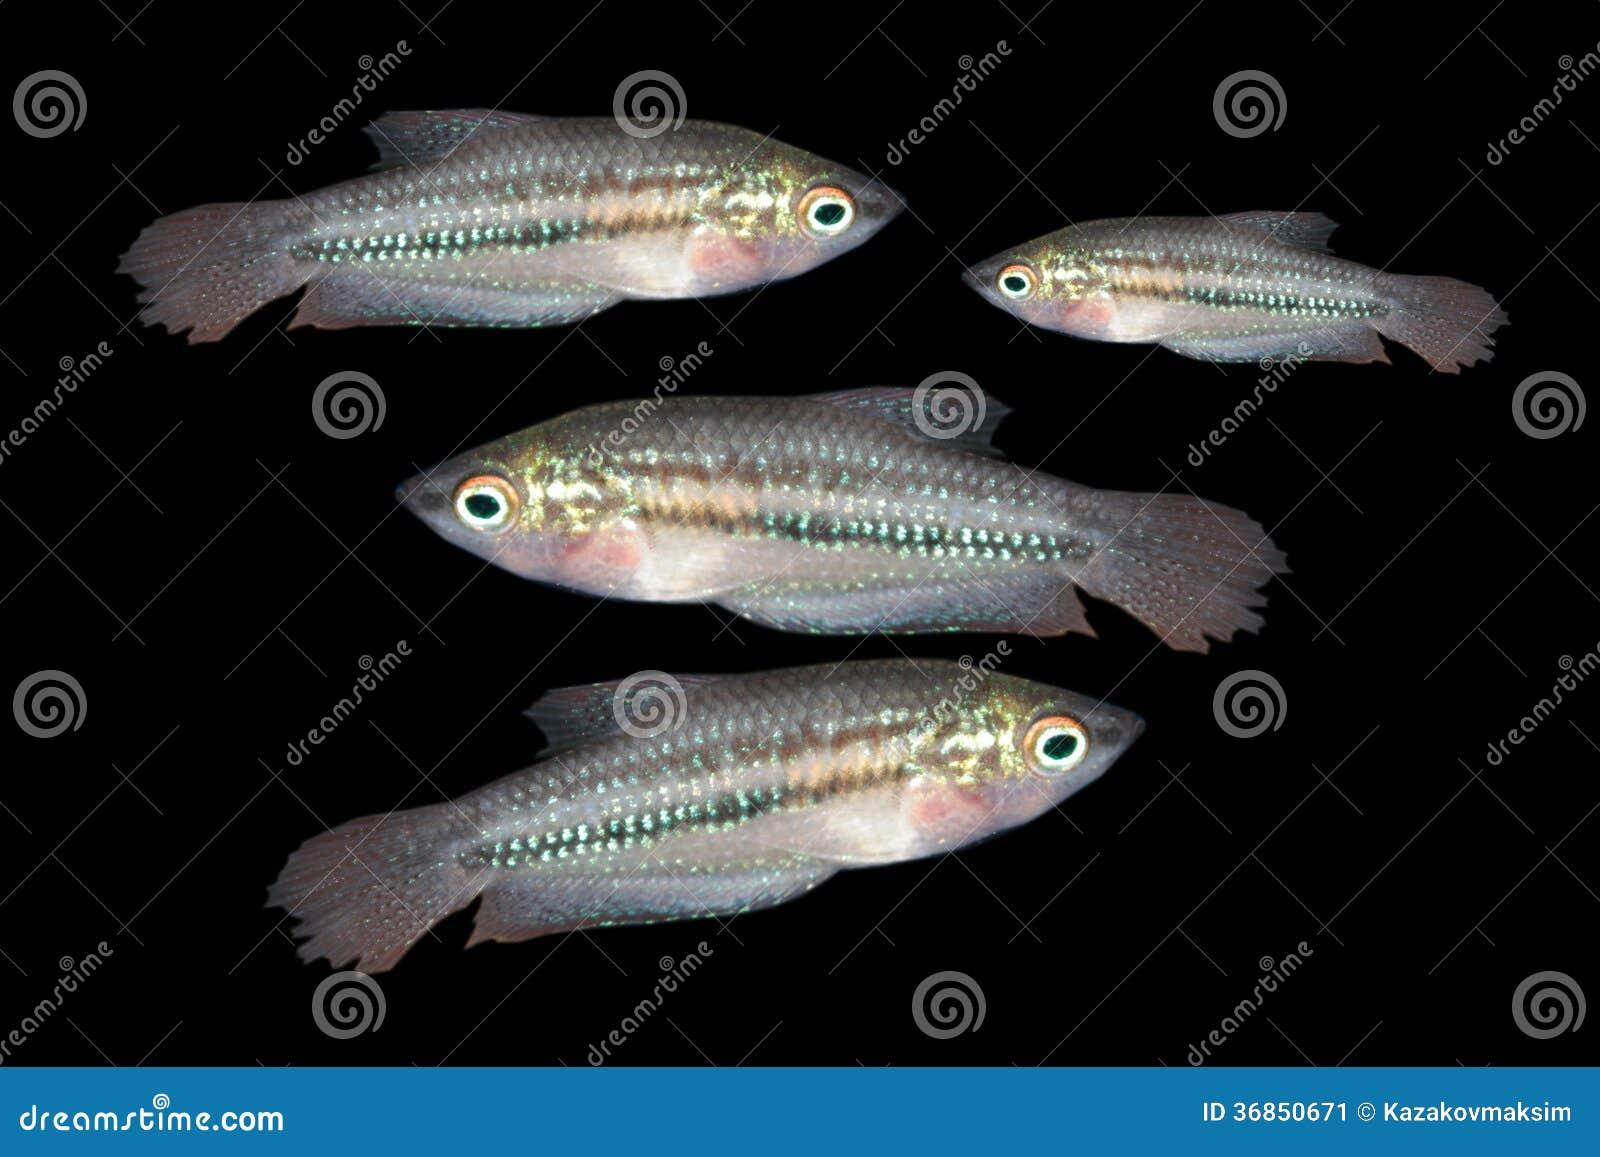 Pygmy gourami (Trichopsis pumilus) freshwater aquarium fish.